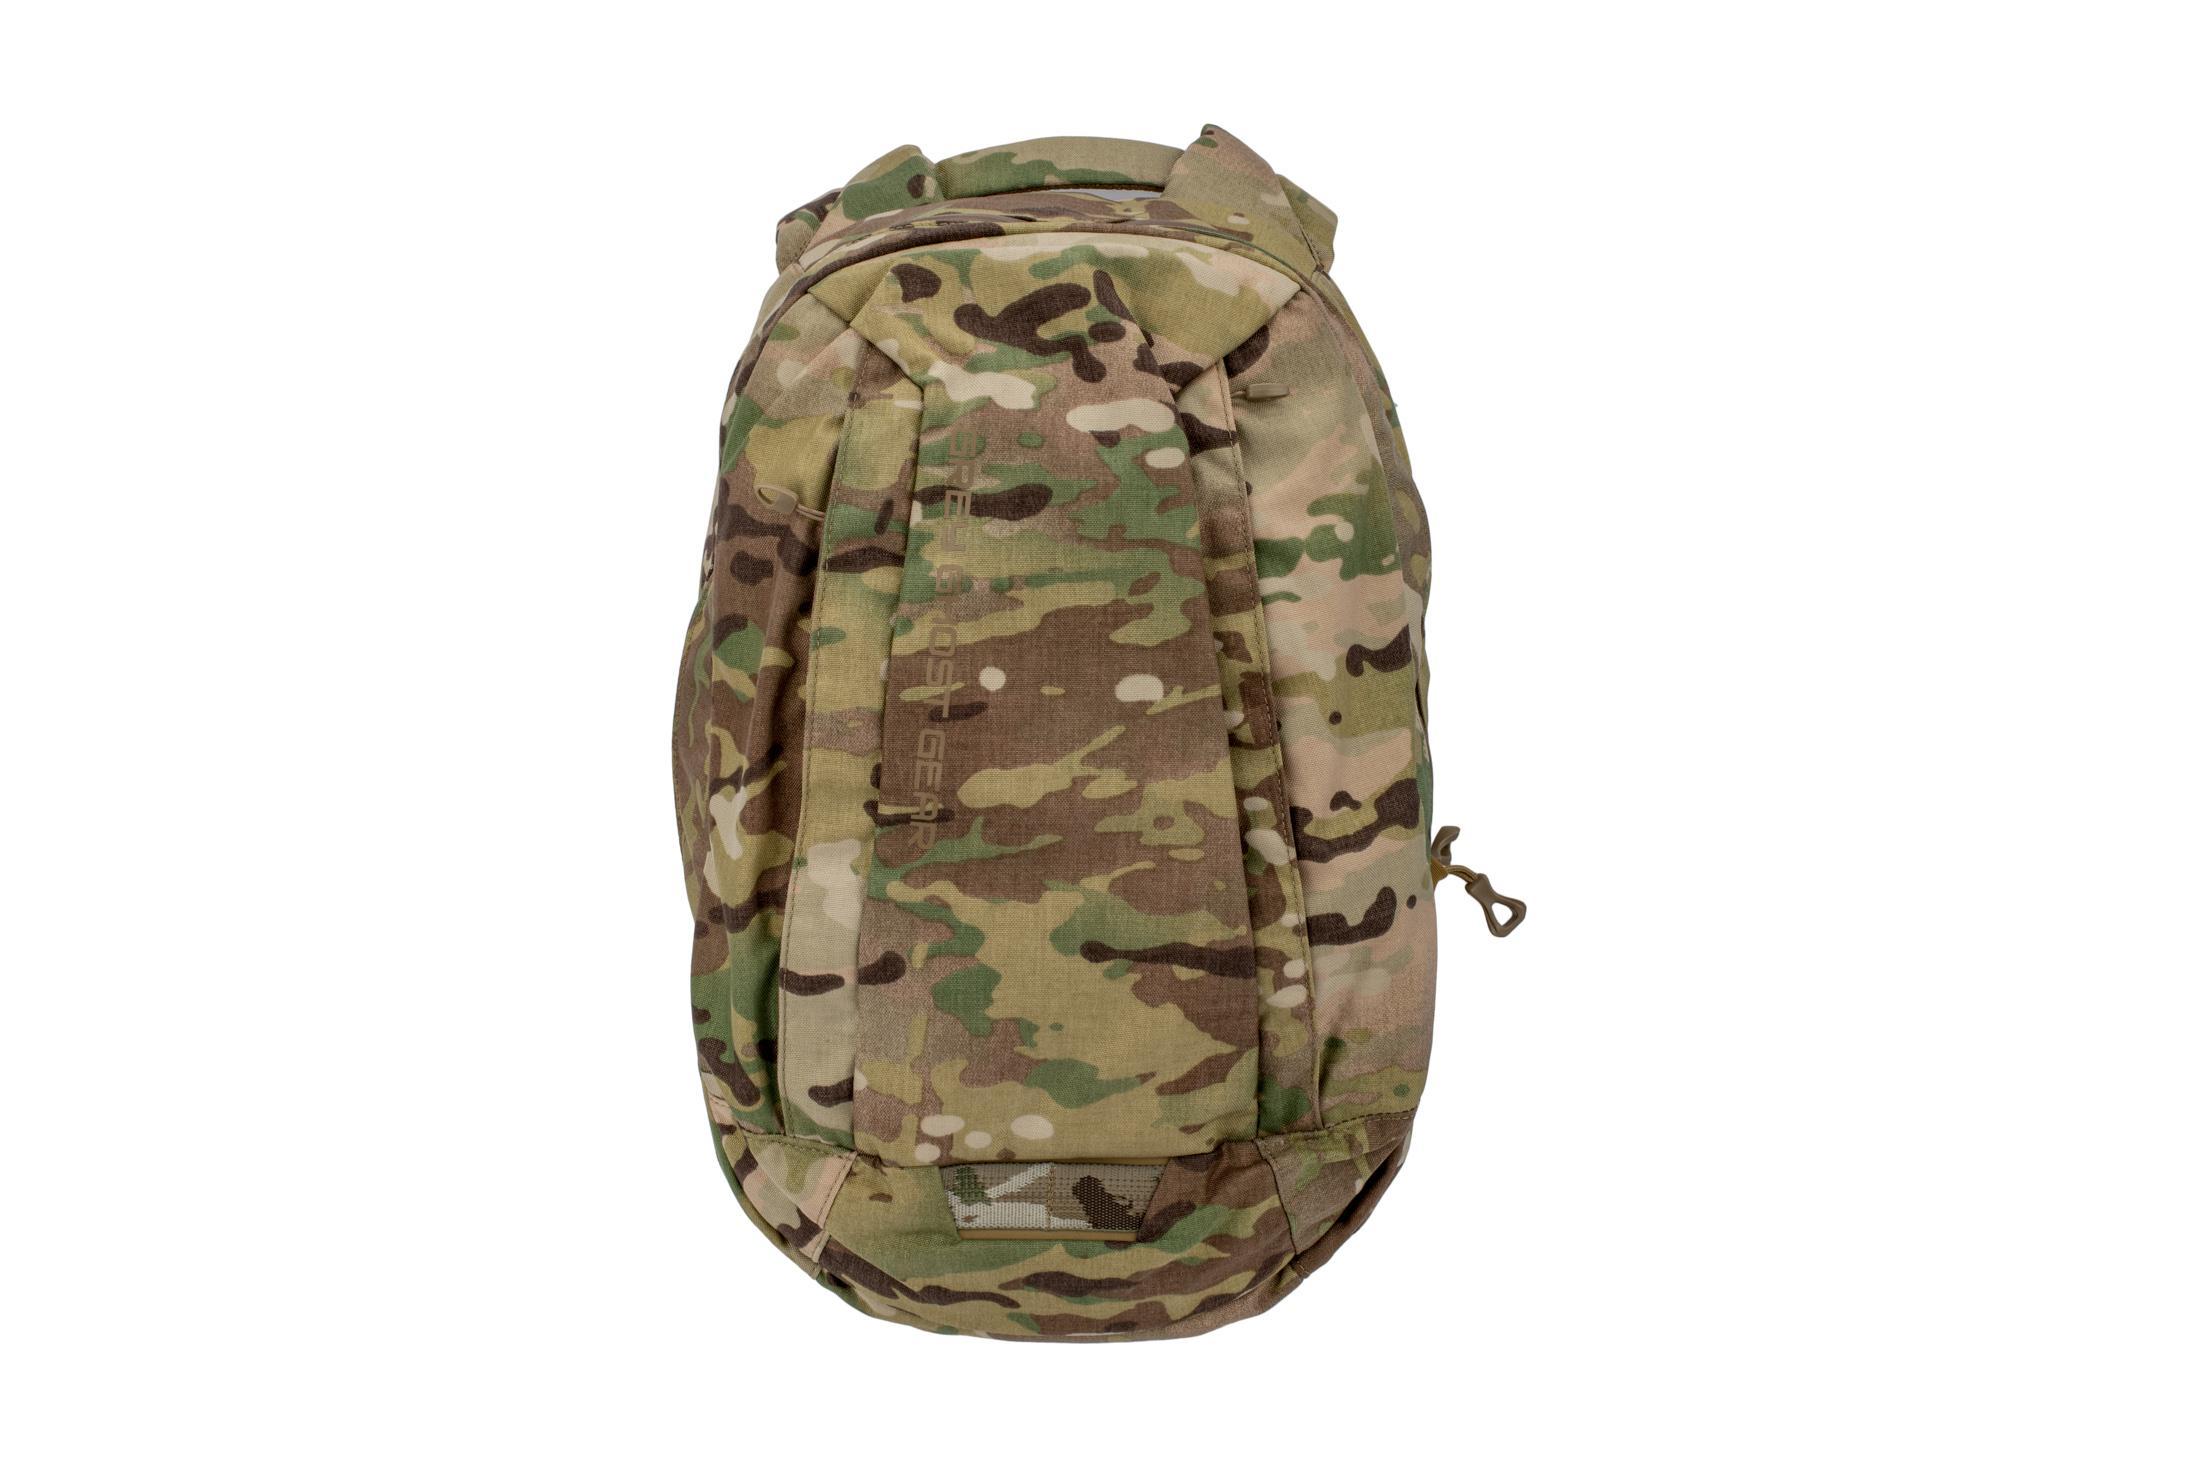 best bug out bag